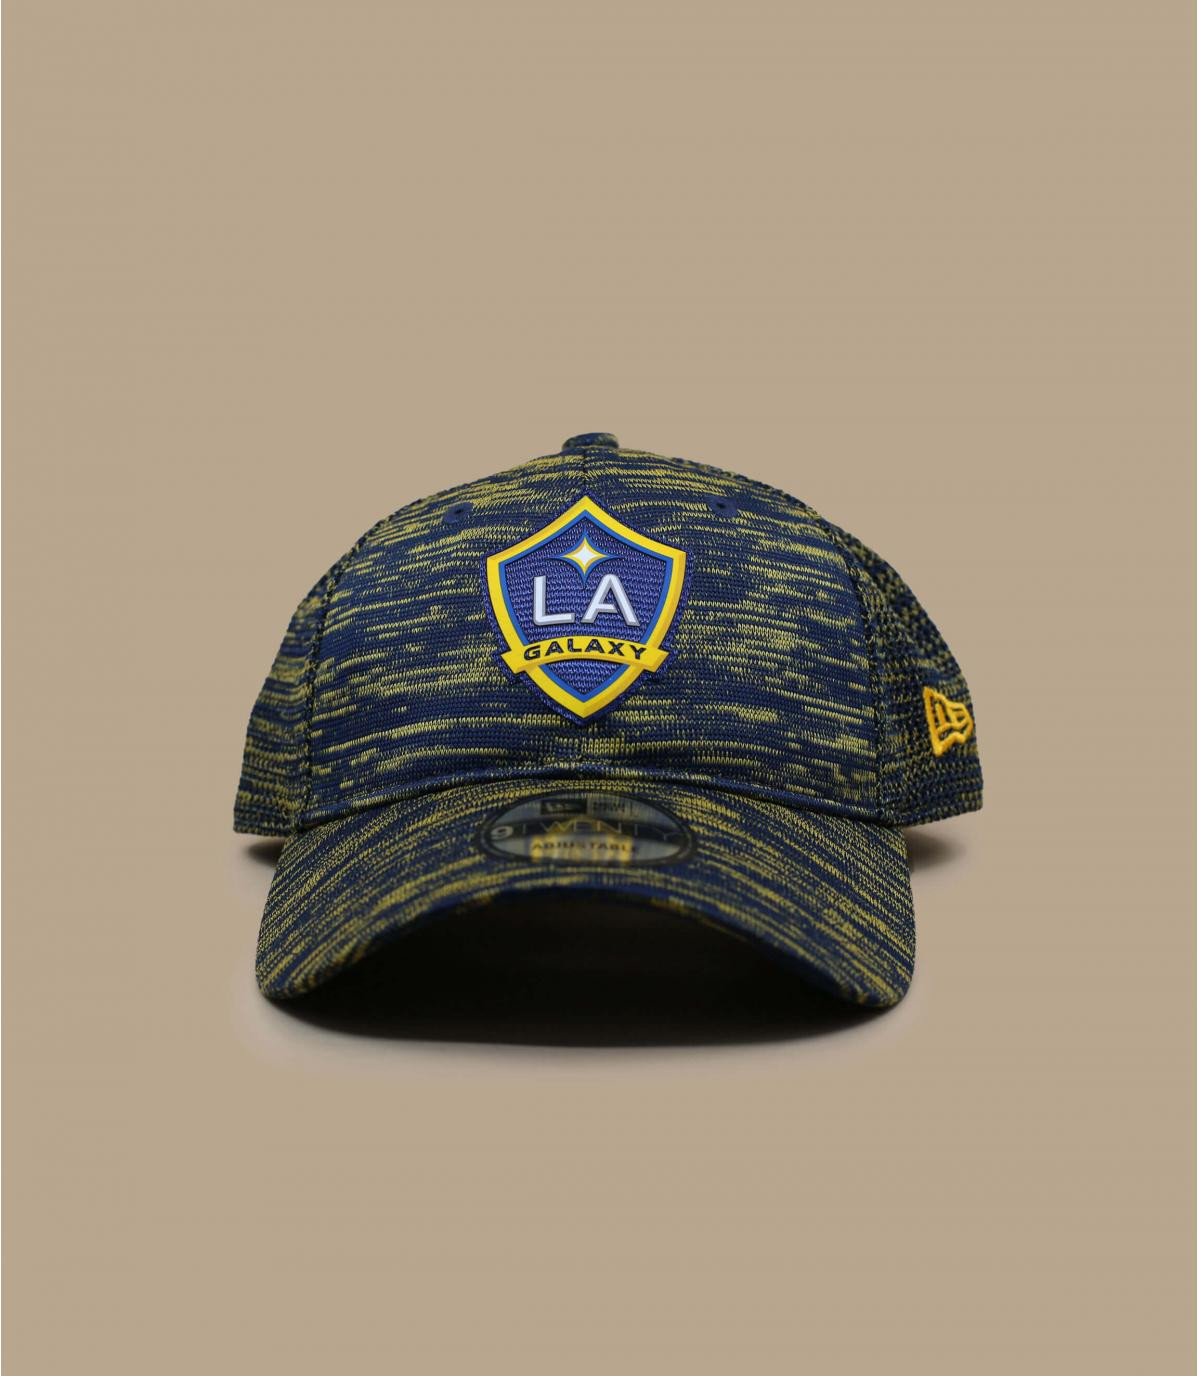 Cappellino LA Galaxy blu